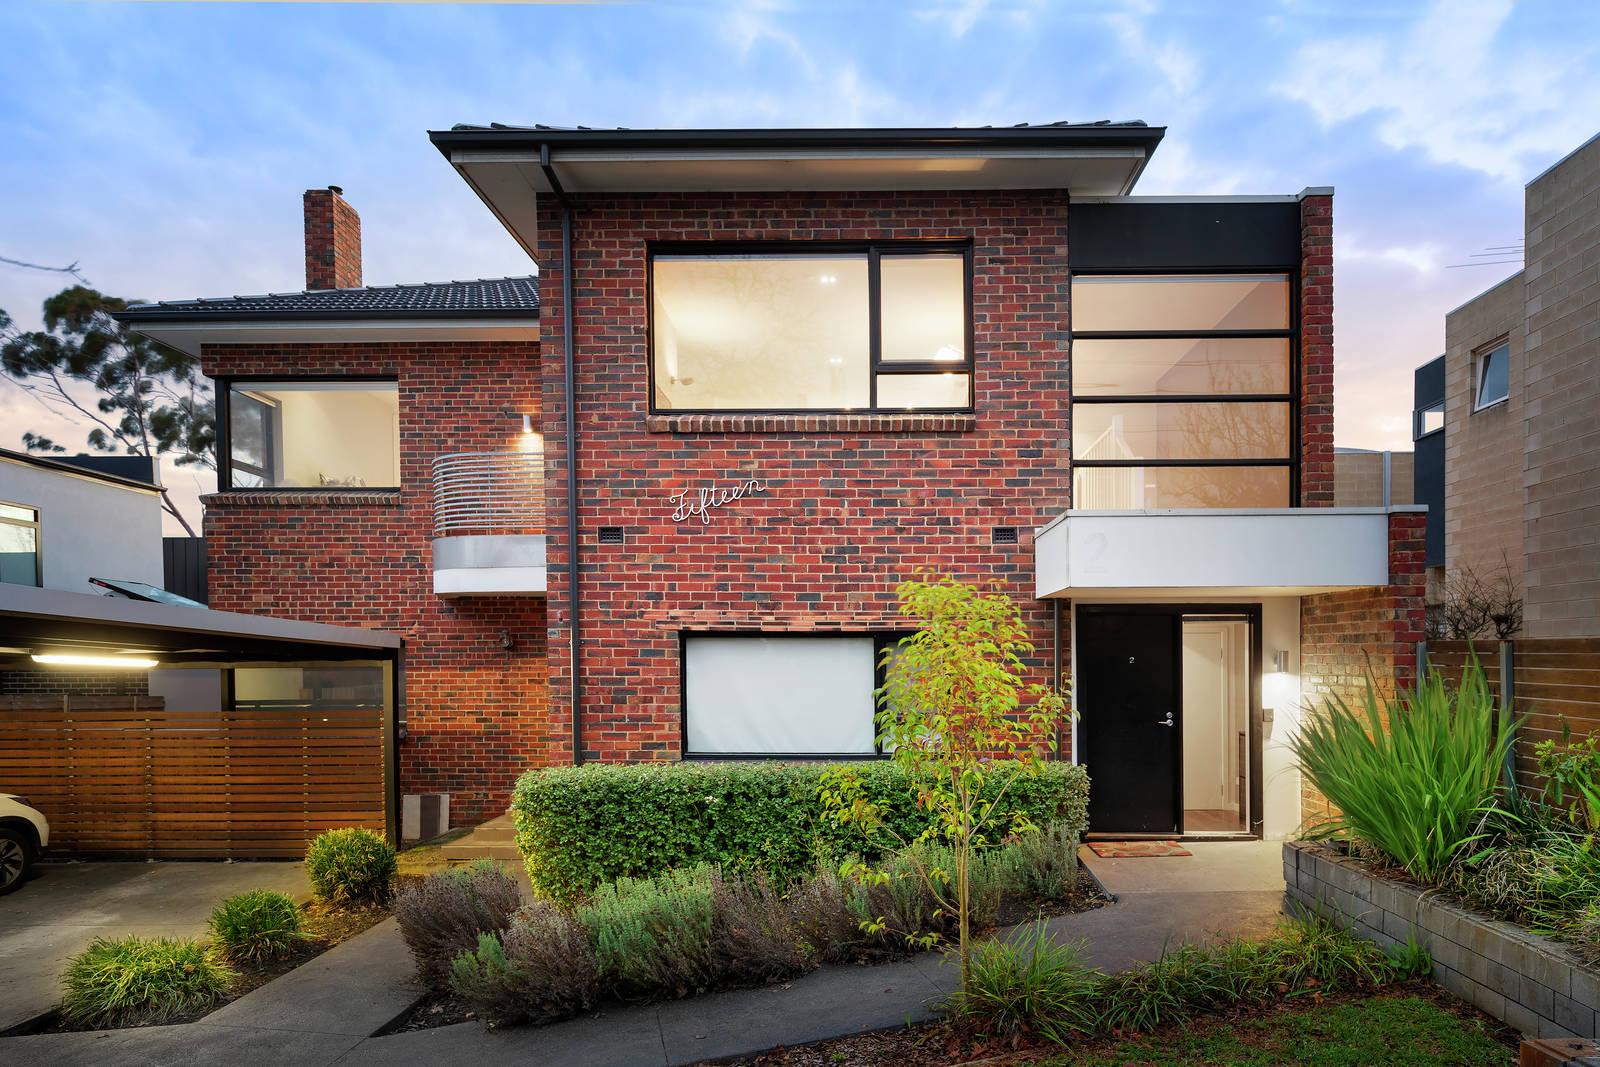 2/15 Munro Street, Kew East, VIC, 3102 image 2